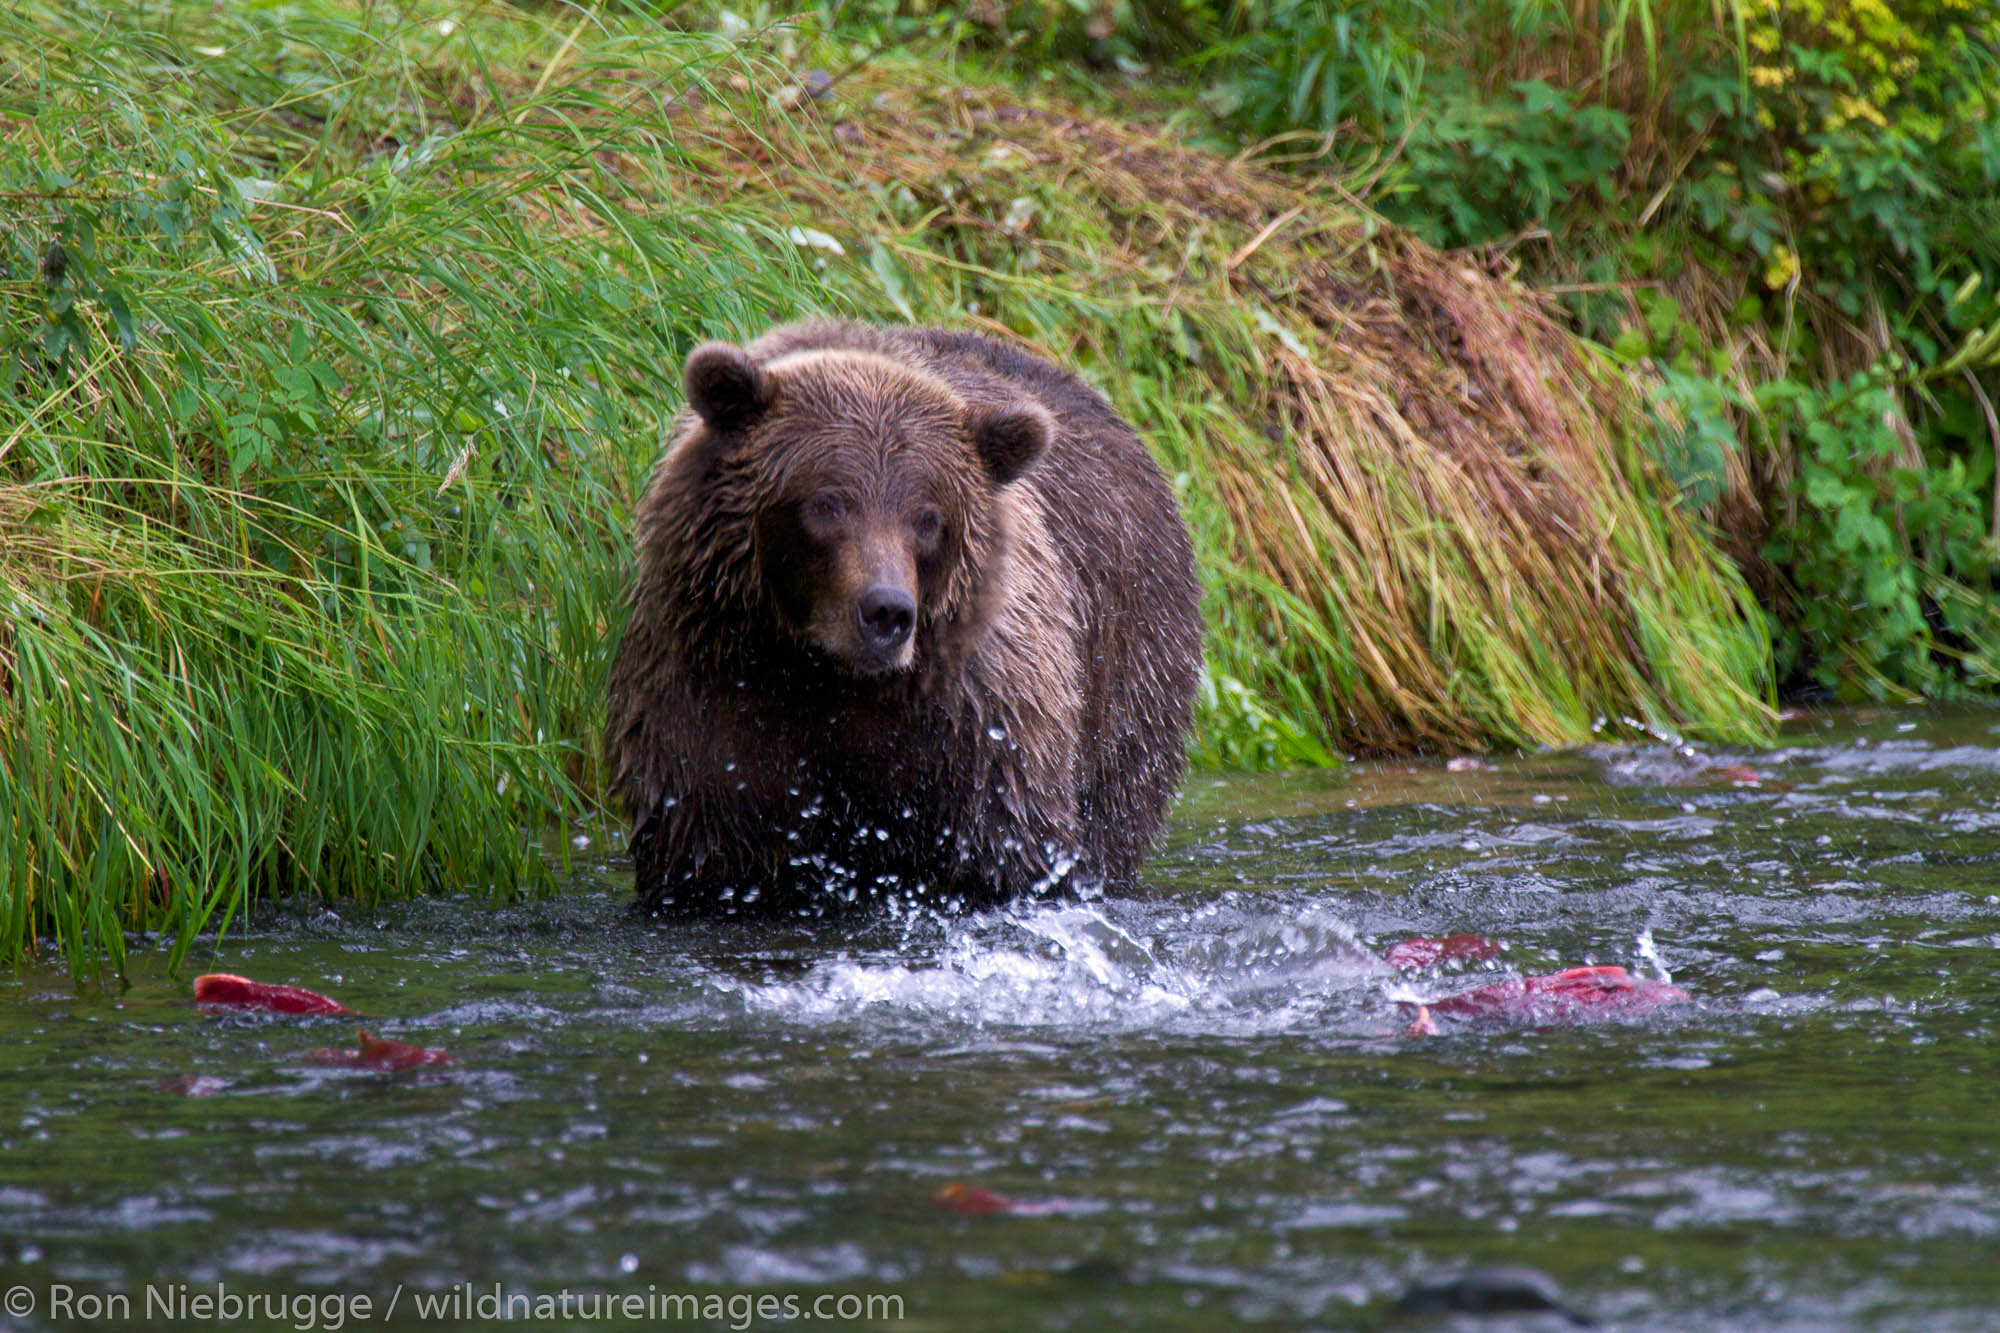 A Brown or Grizzly Bear, Chugach National Forest, near Seward, Alaska.